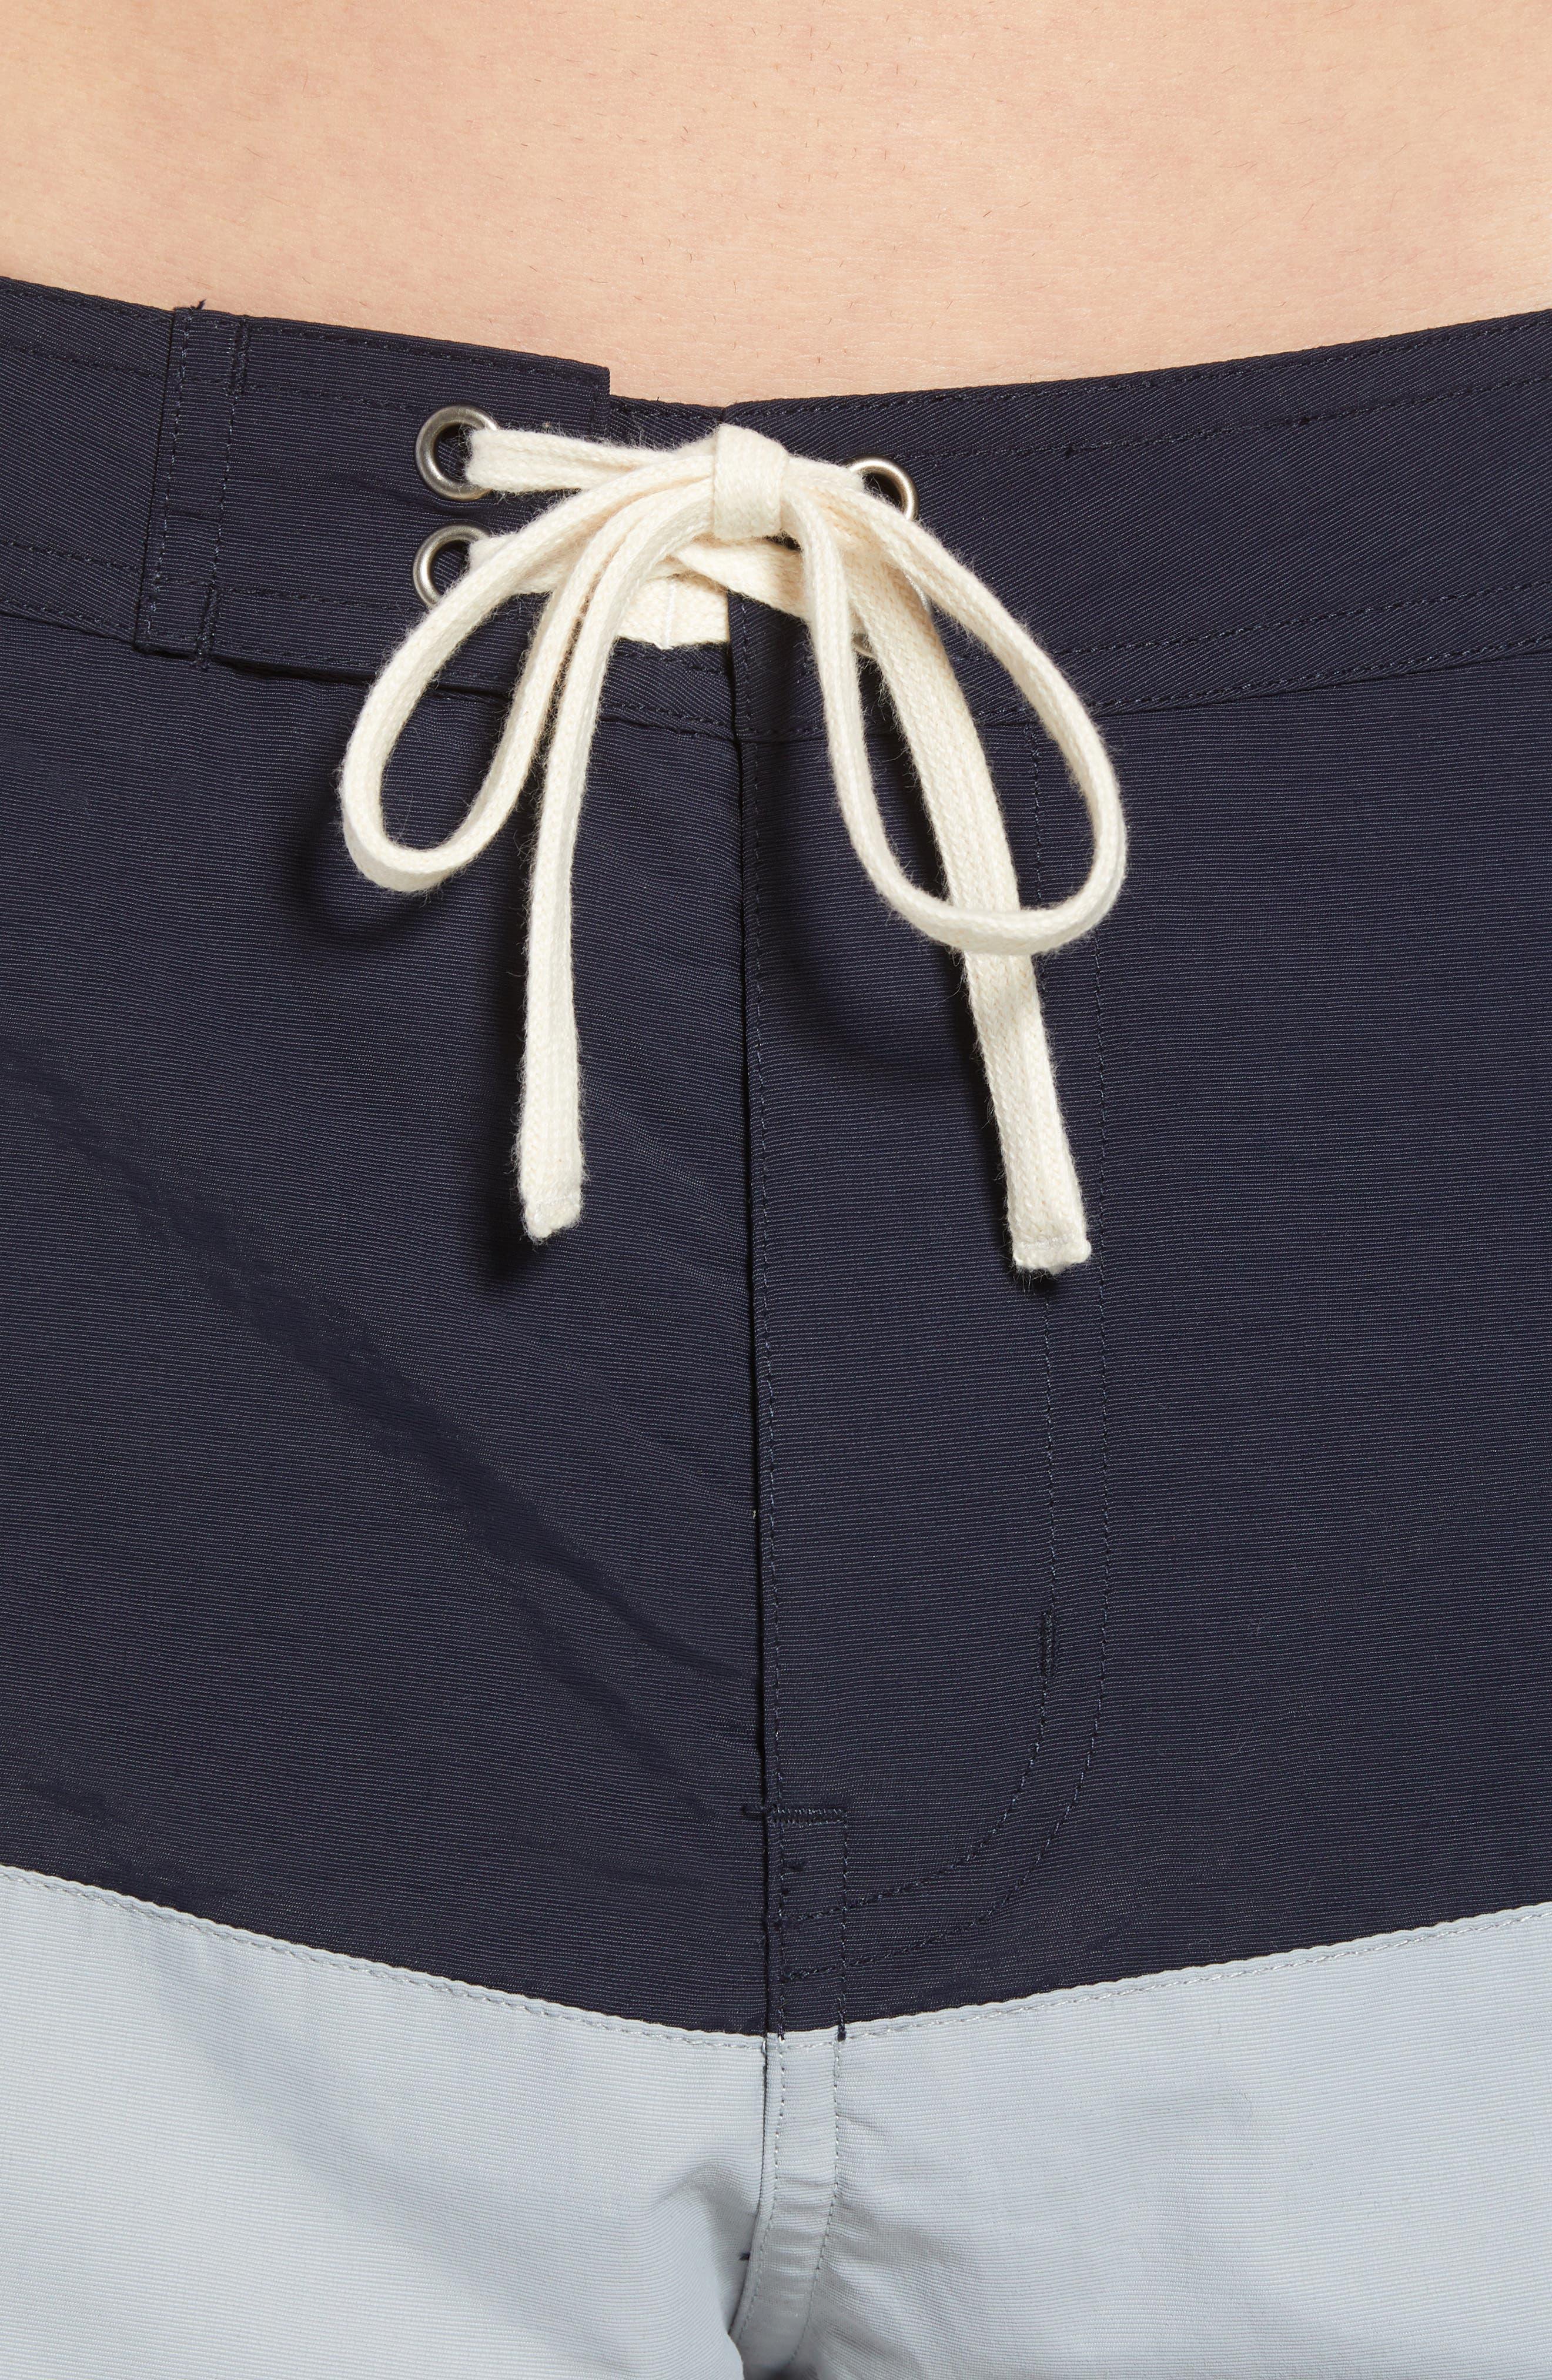 Ennis Board Shorts,                             Alternate thumbnail 4, color,                             408